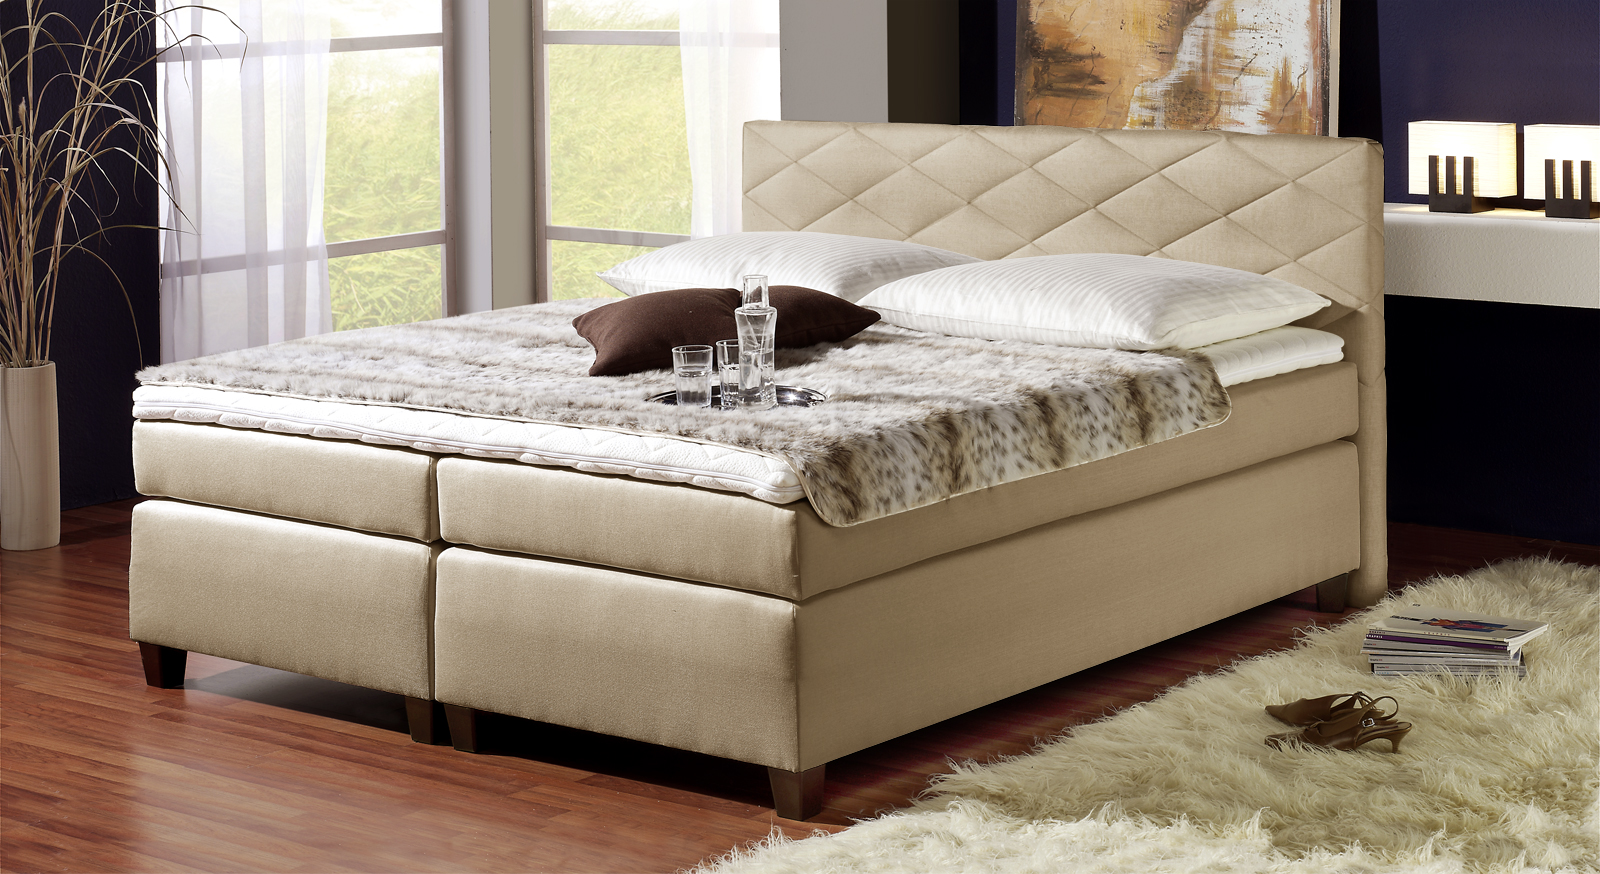 boxspringbett 140 200 g nstig fotos das wirklich ehrfurcht. Black Bedroom Furniture Sets. Home Design Ideas